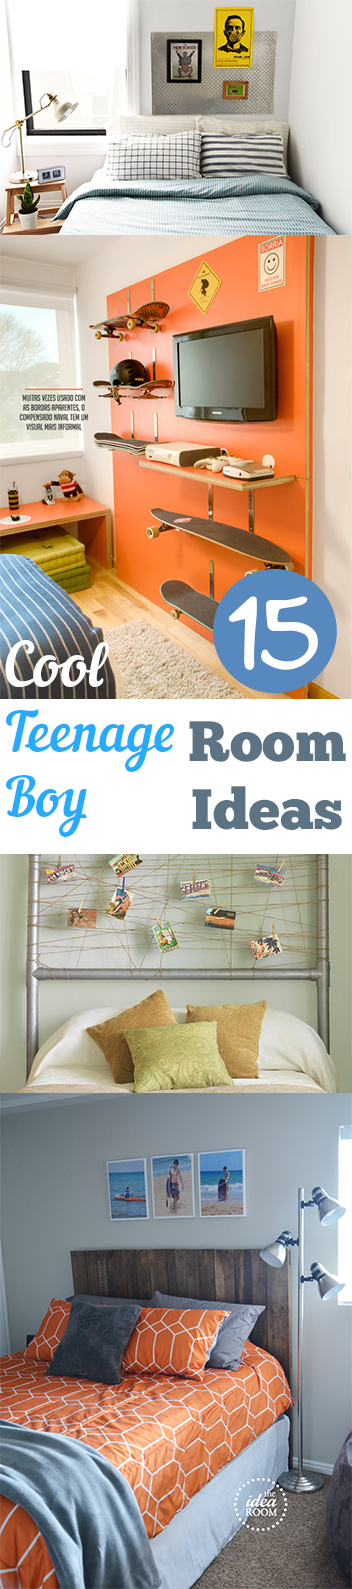 15-Cool-Teenage-Boy-Room-Ideas